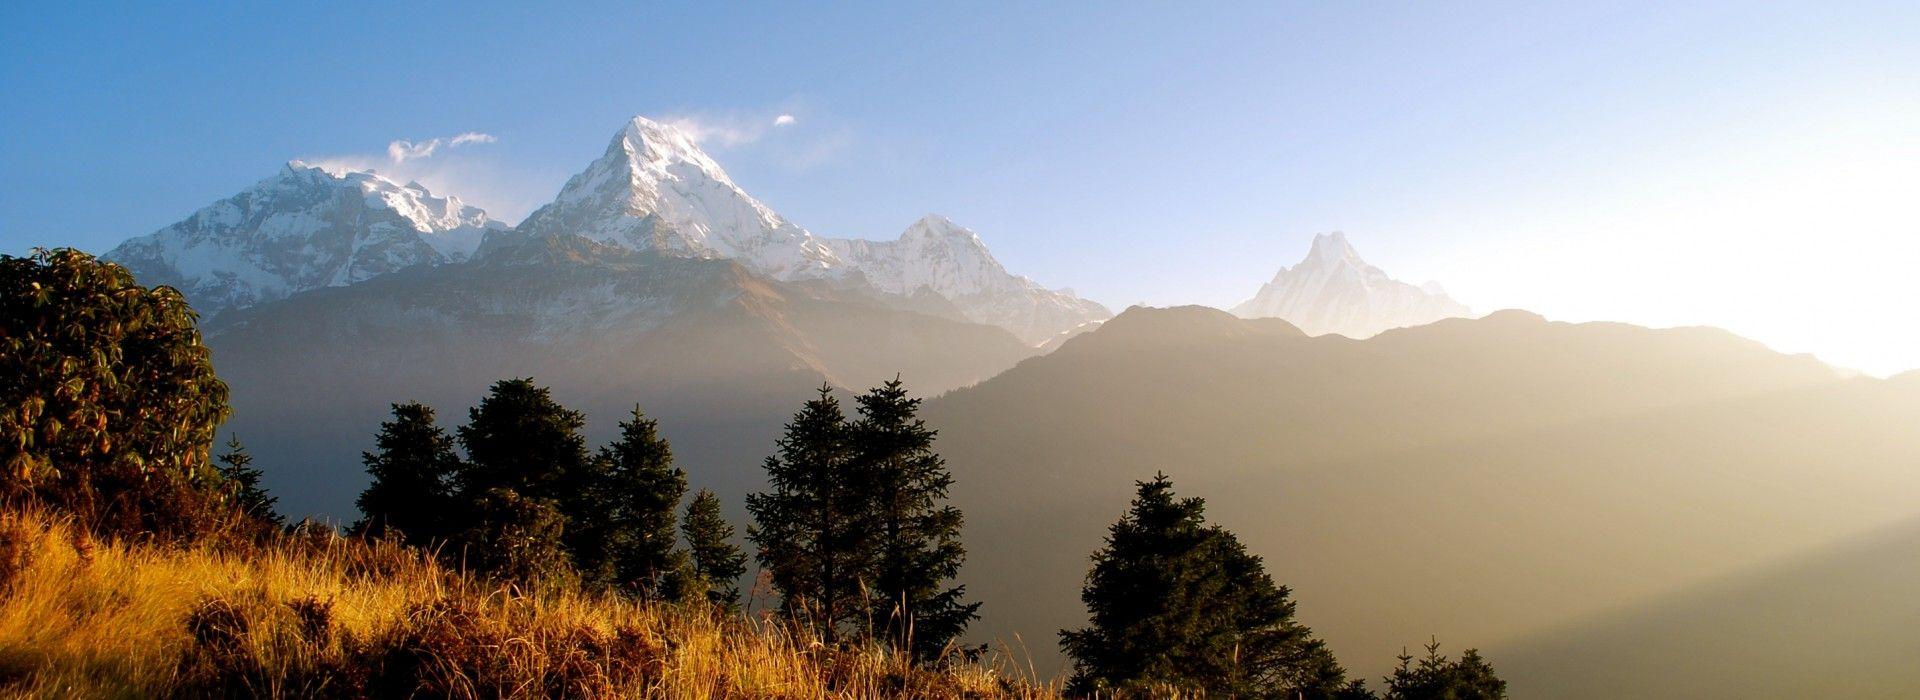 Wildlife, landscapes and nature Tours in Everest Base Camp trek